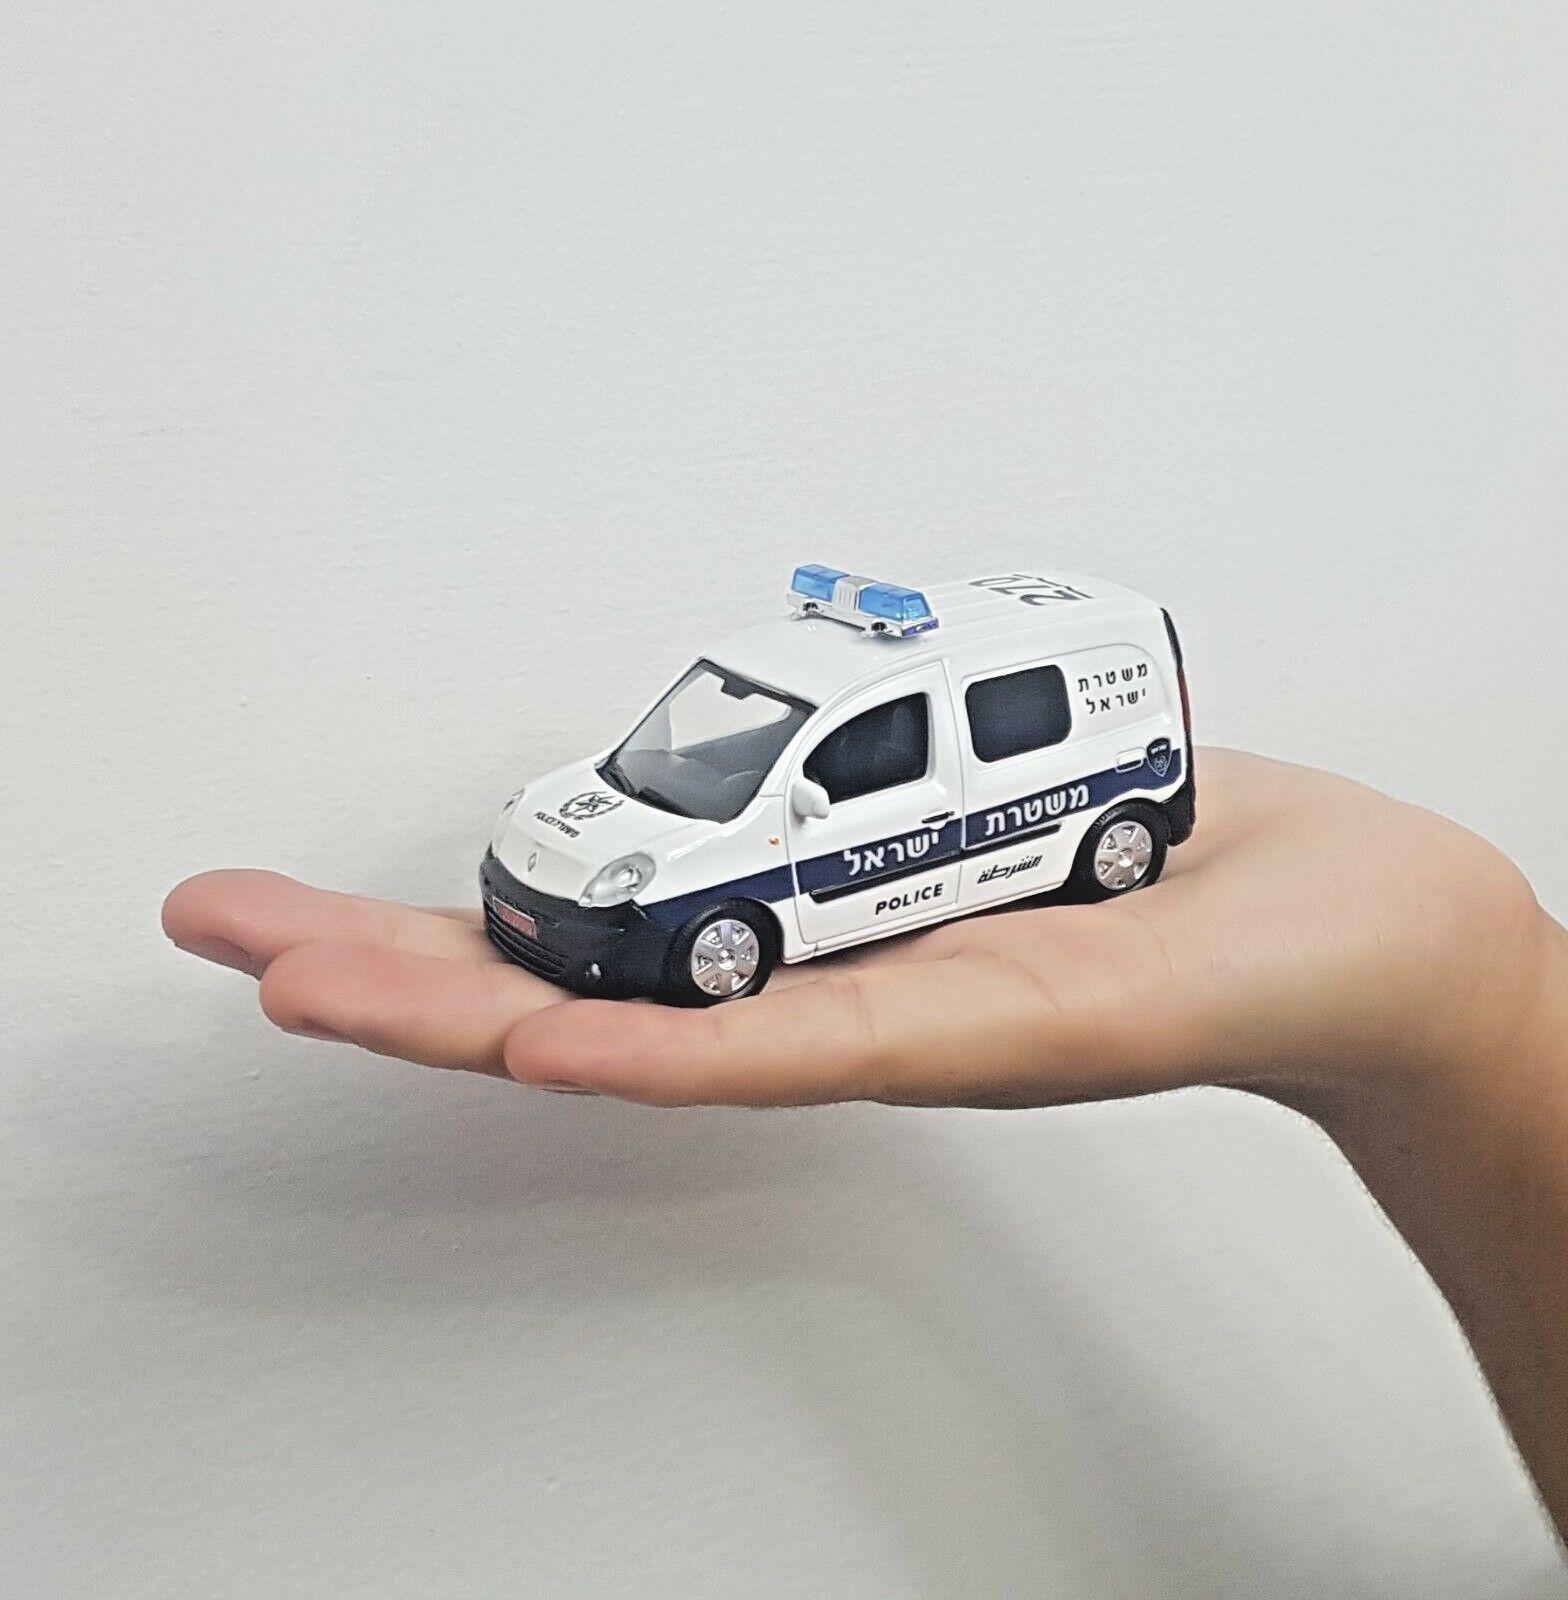 Seltene israel polizeiauto renault kangoo - skala 1 43 modell spielzeug - geschenk